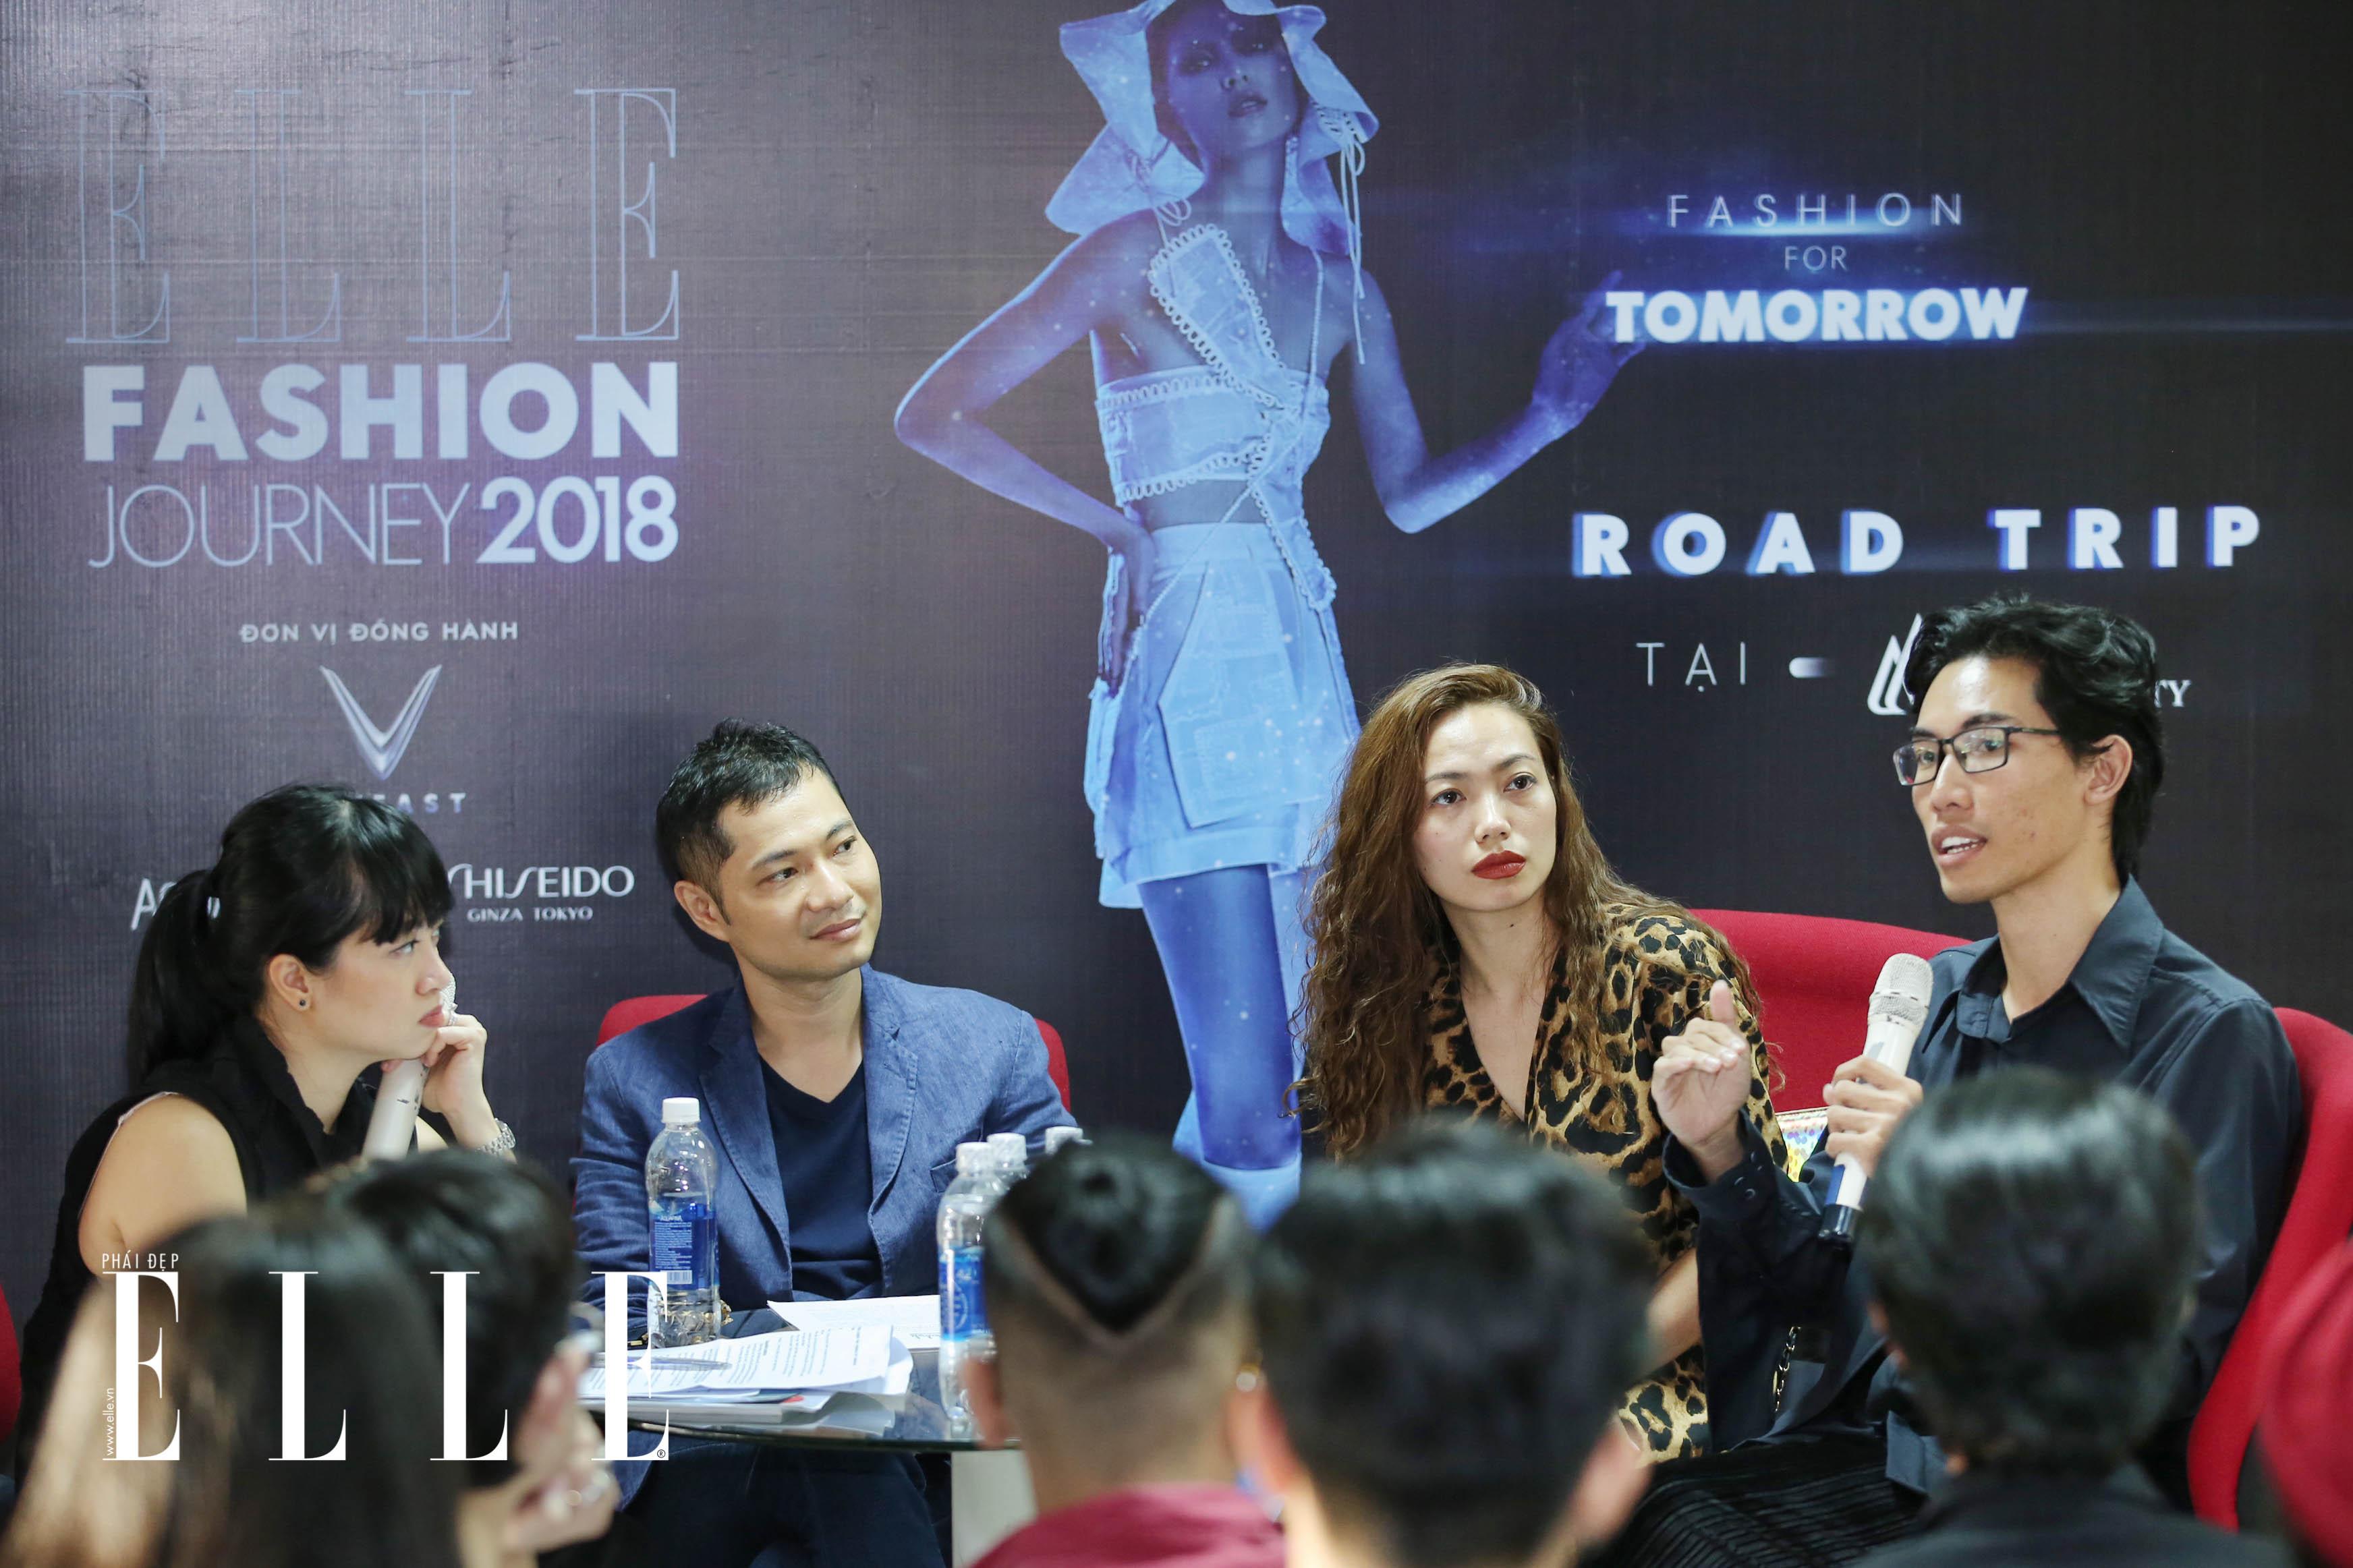 ELLE Fashion Journey 2018 3